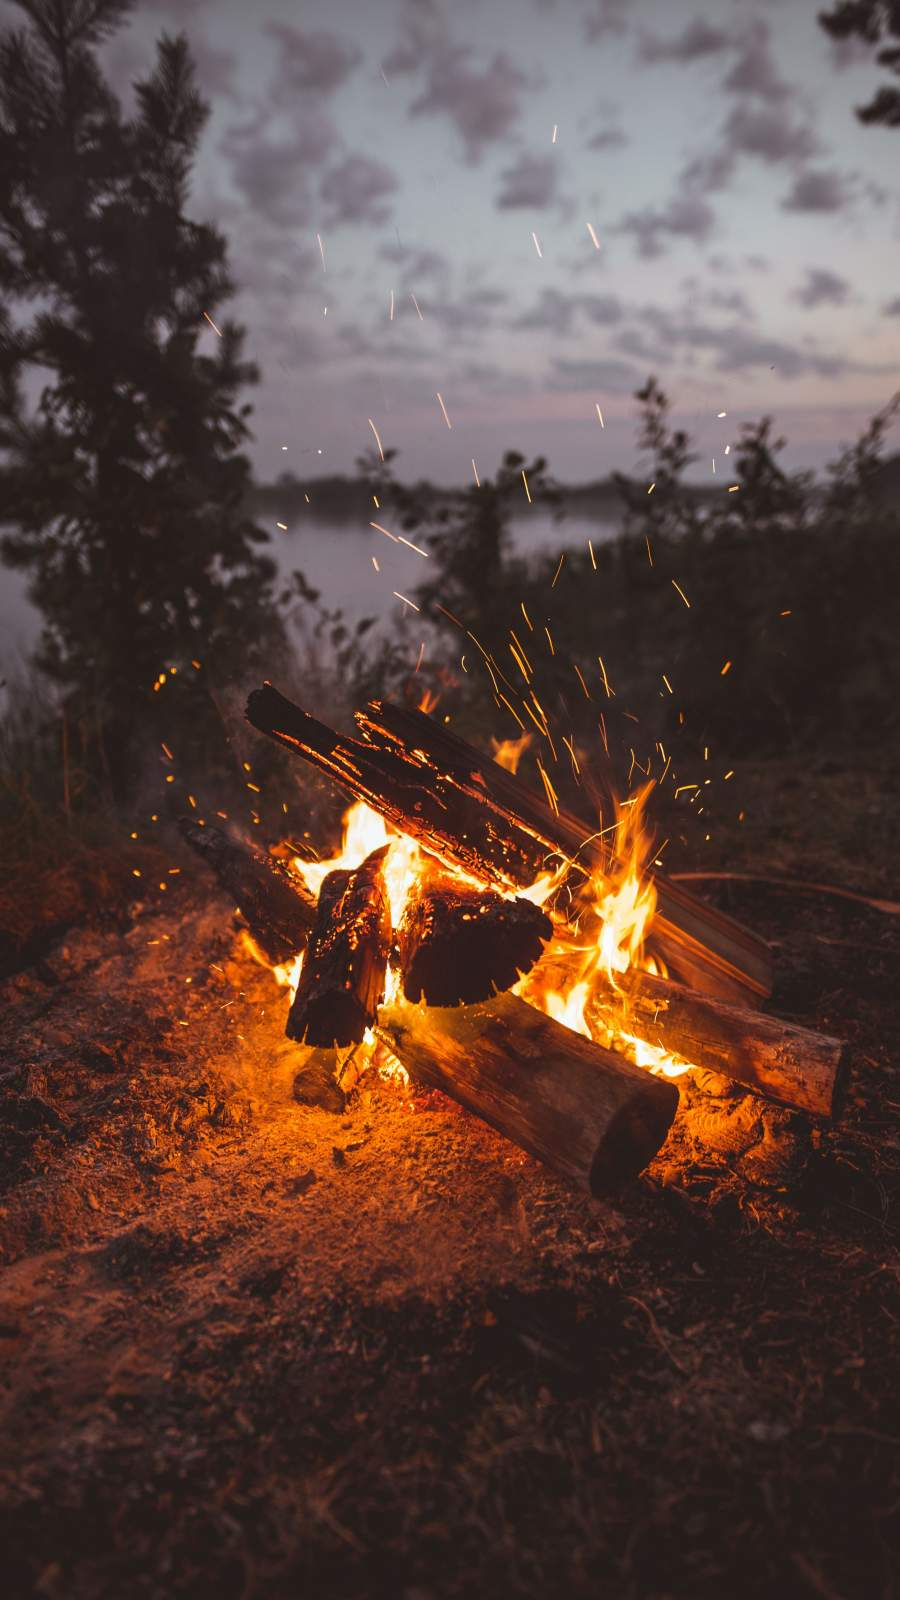 Firewood Burning iPhone Wallpaper